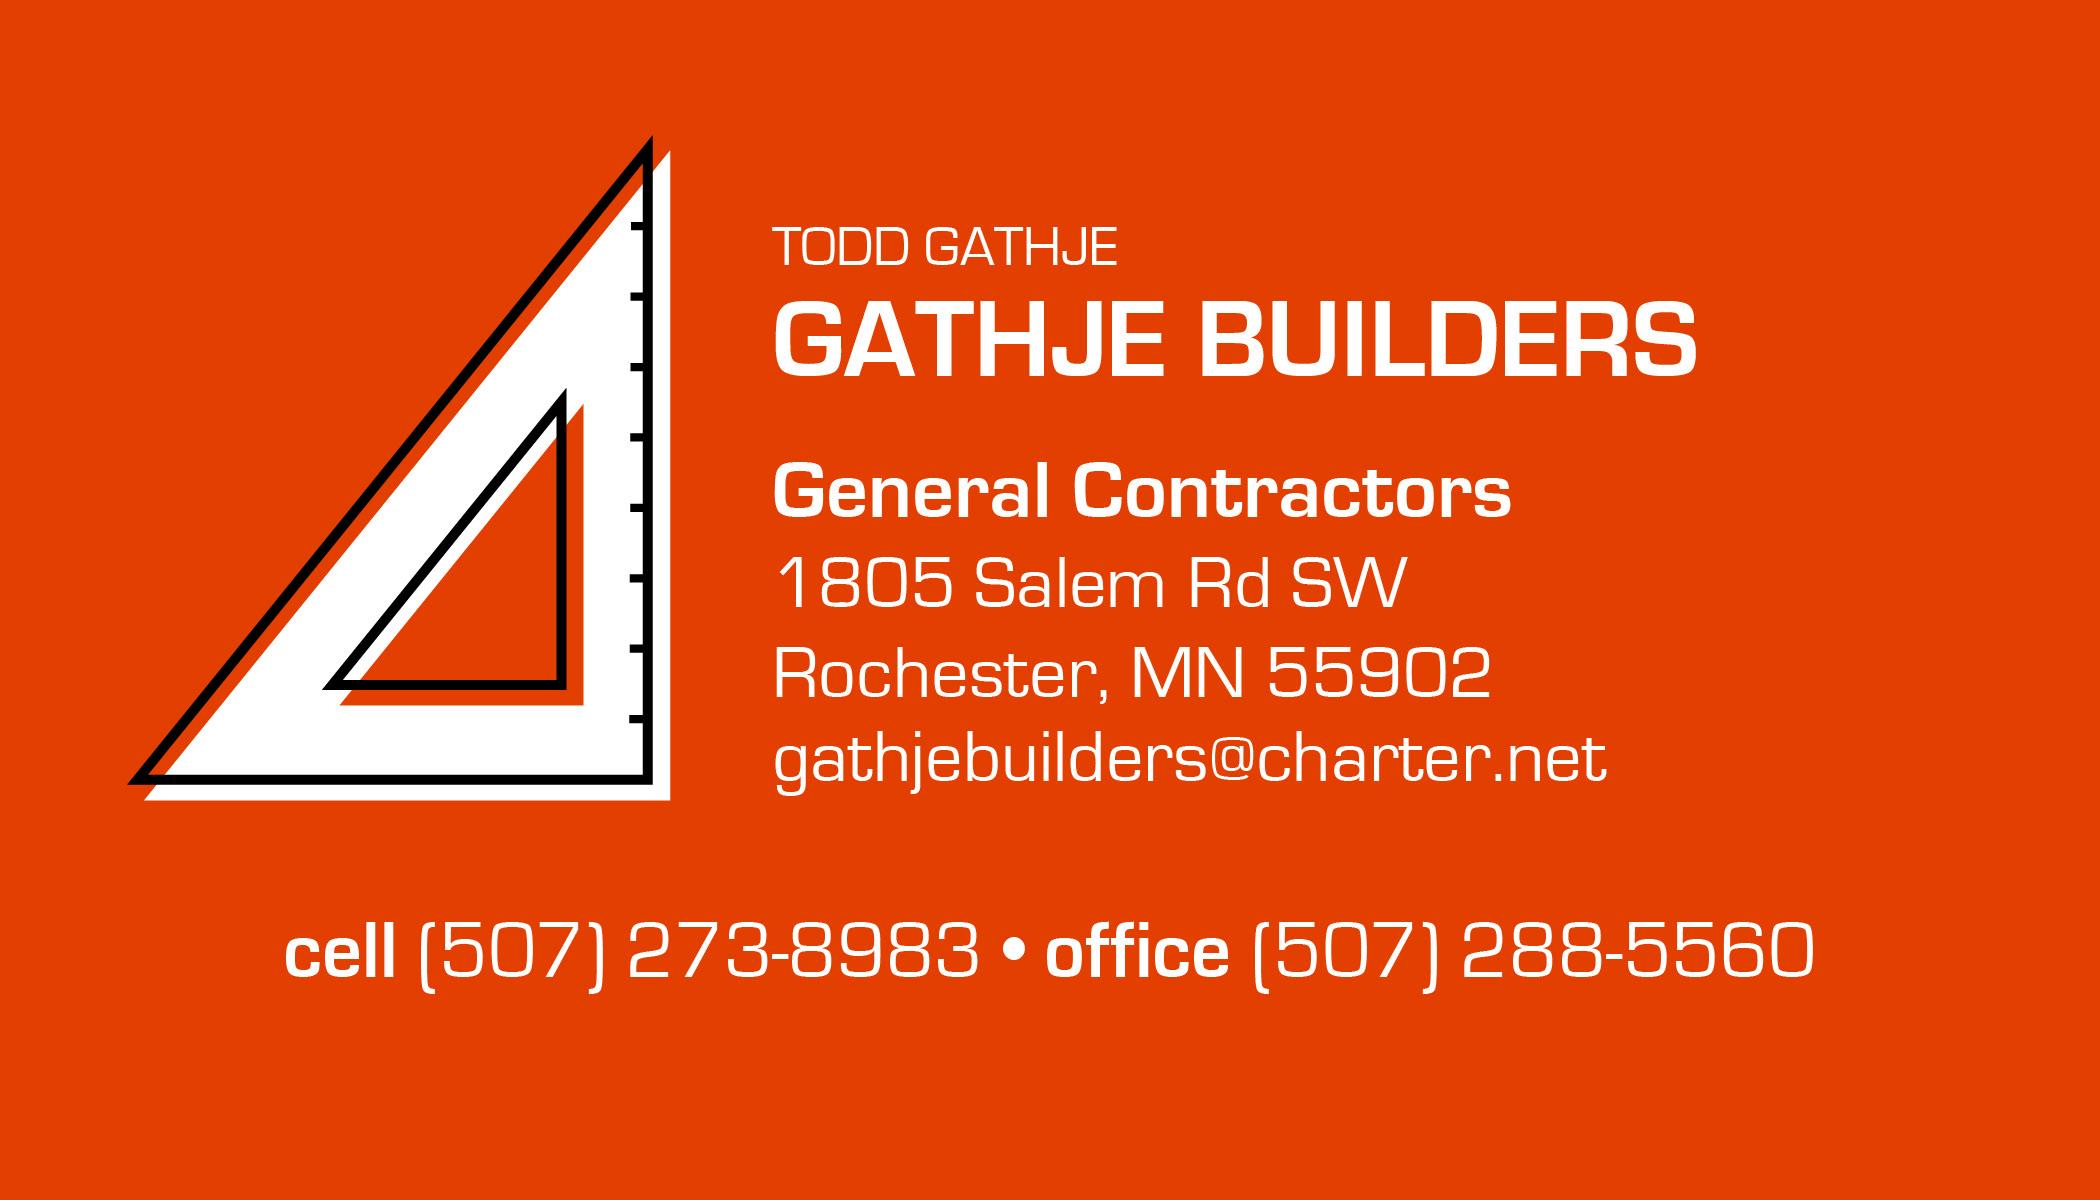 Gathje Builders